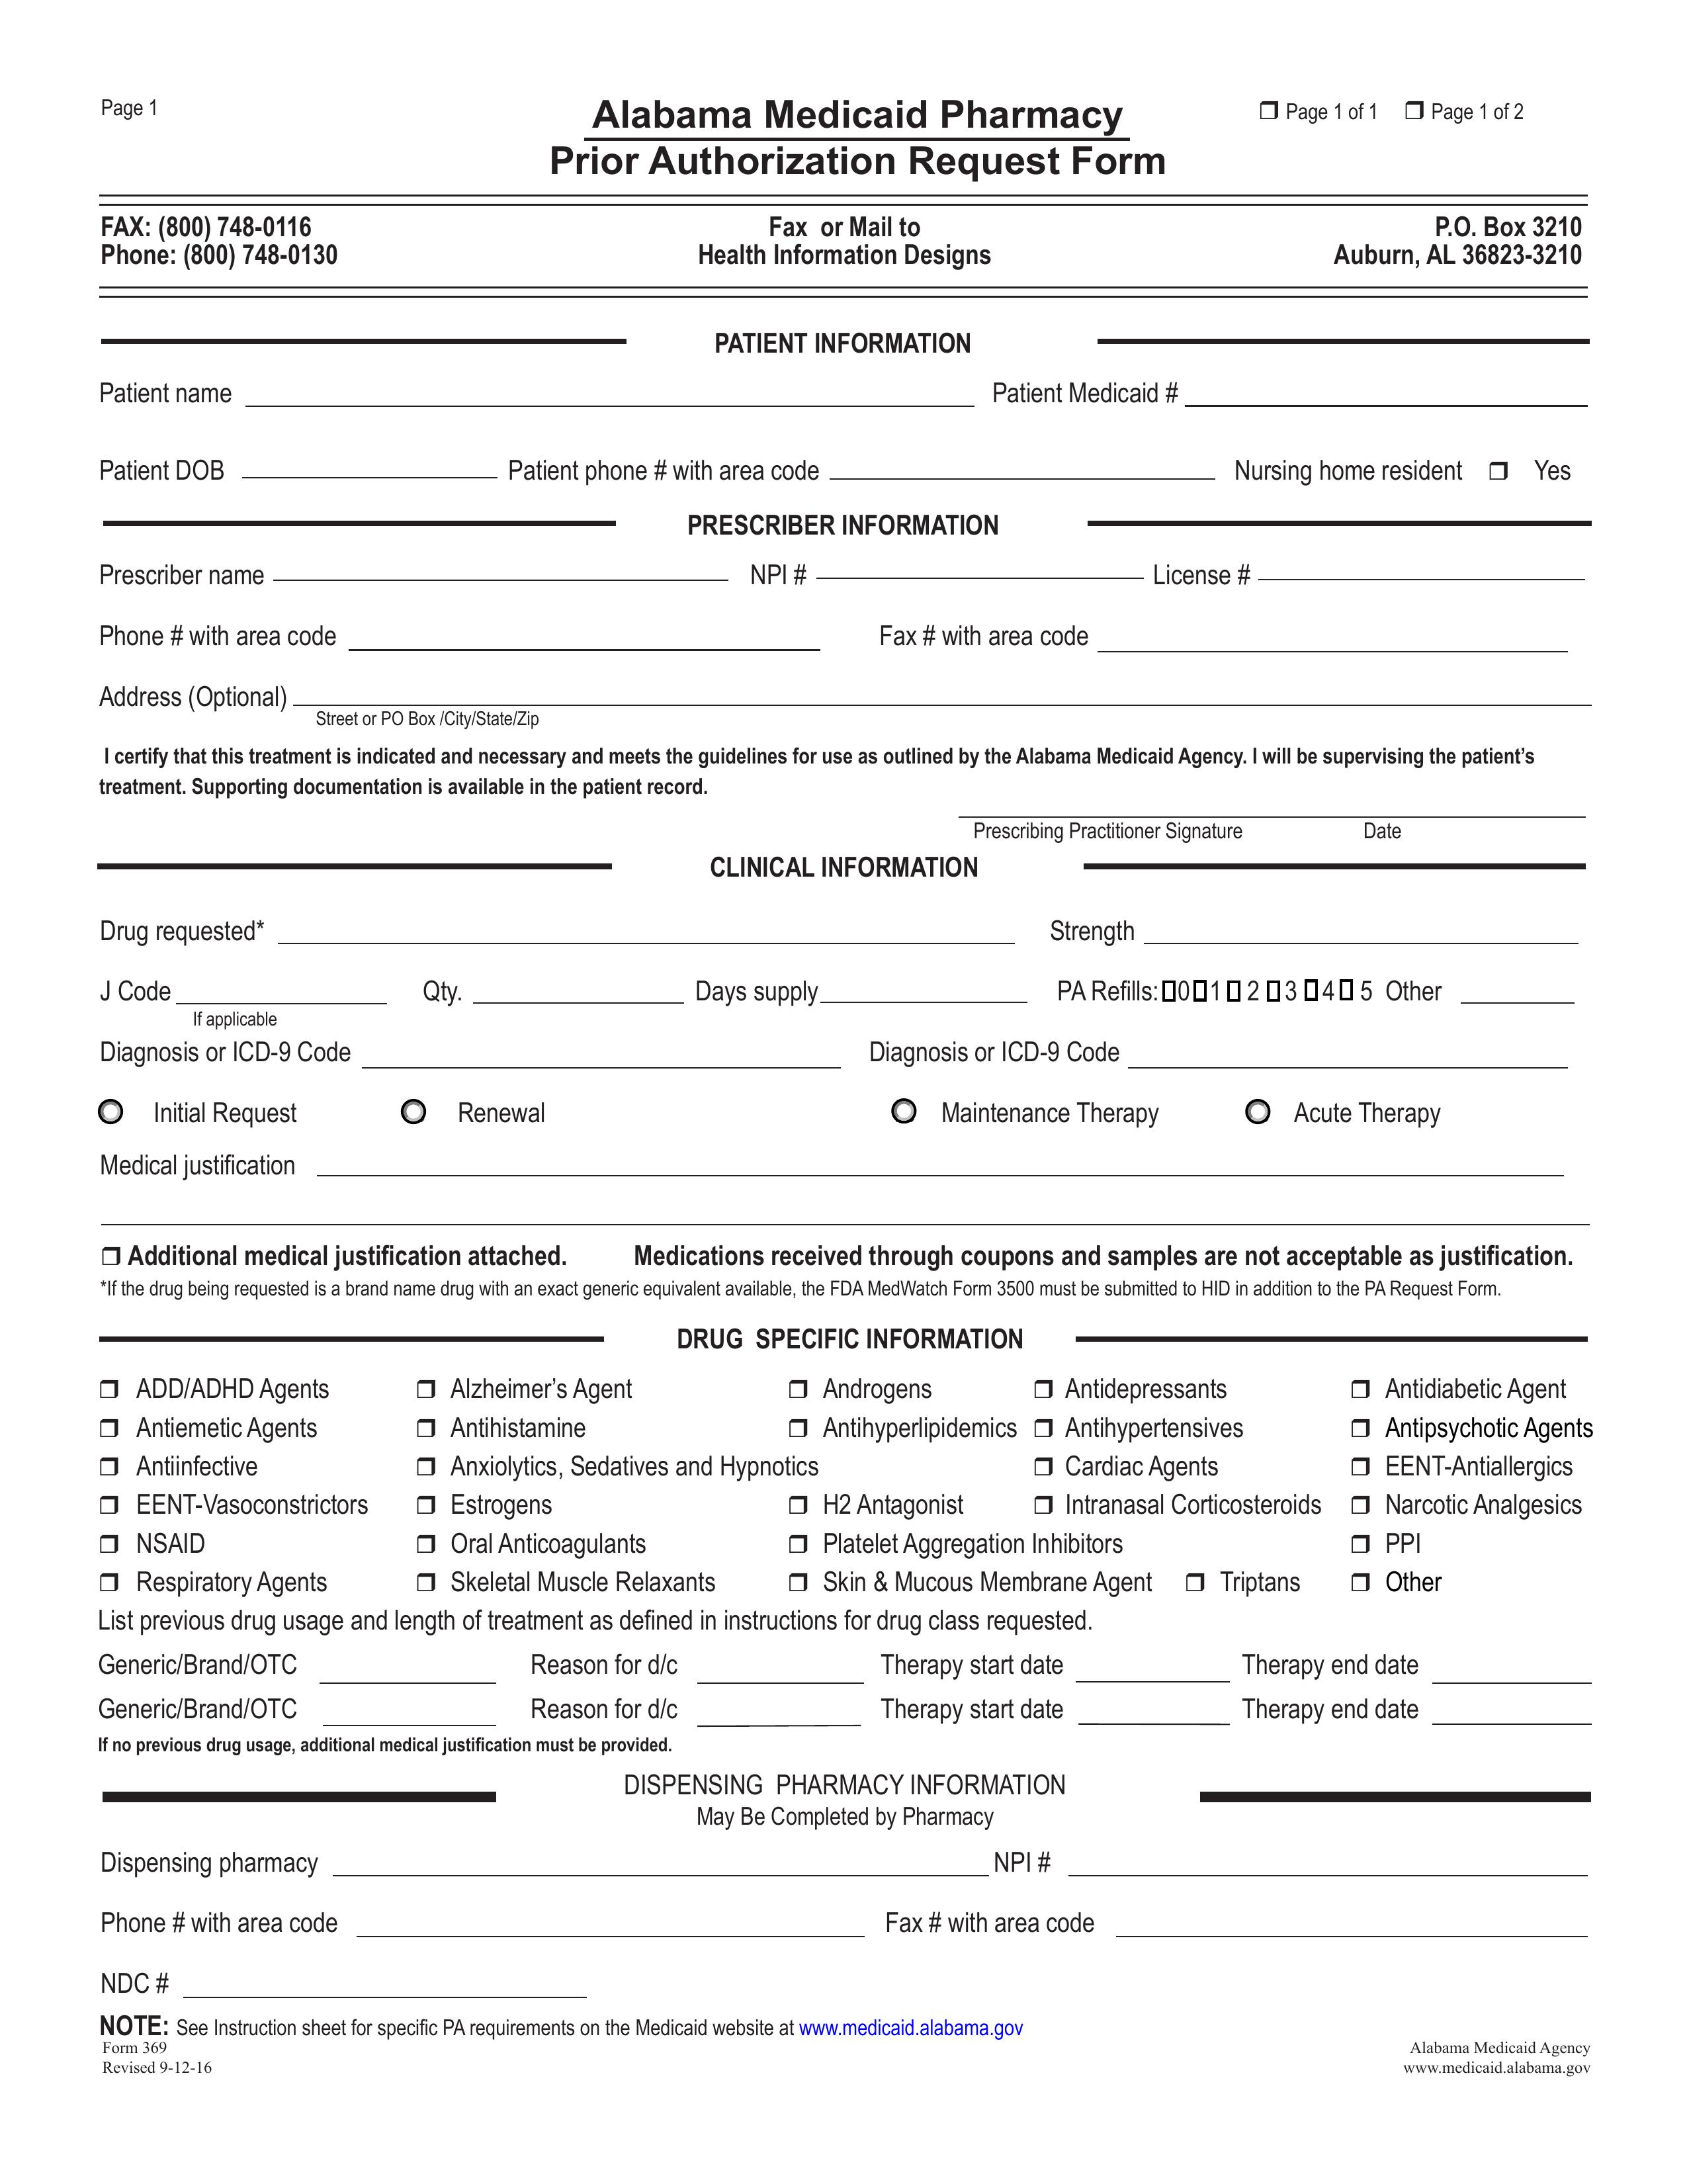 Free Alabama Medicaid Prior (Rx) Authorization Form - PDF ...